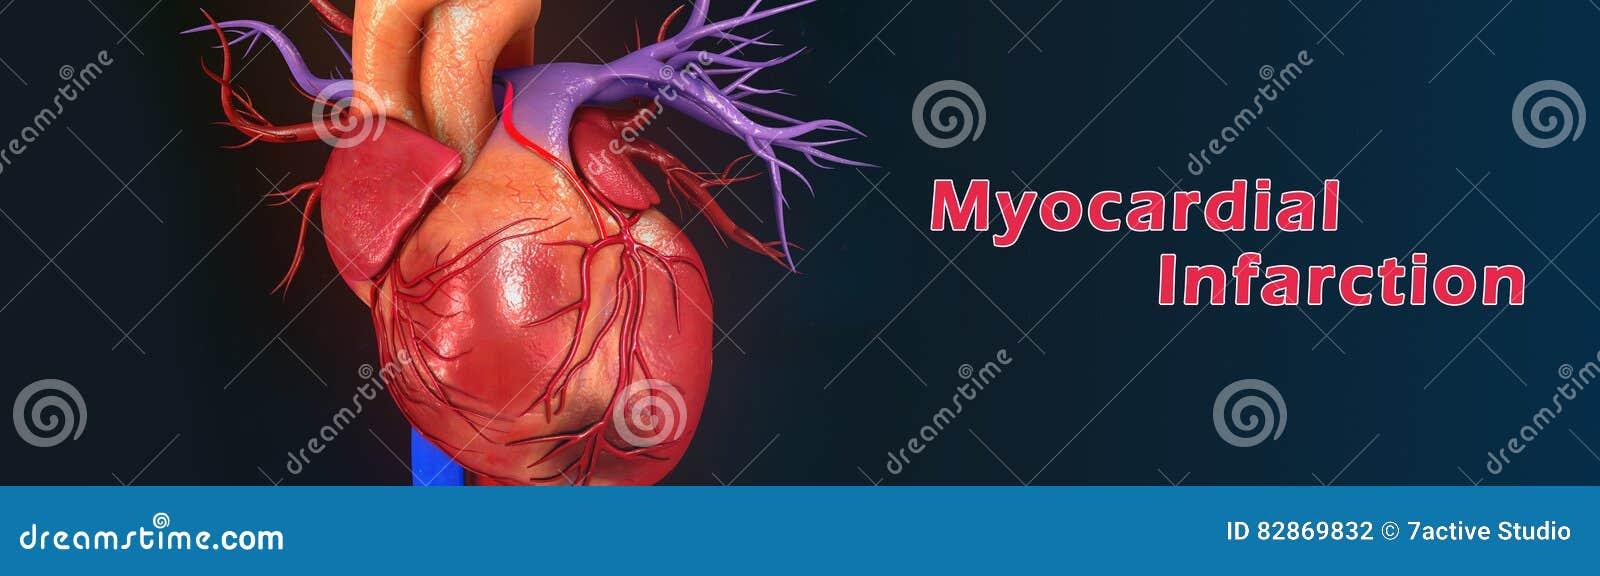 Myocardial infarction stock photo. Image of diesnsymptoms - 82869832